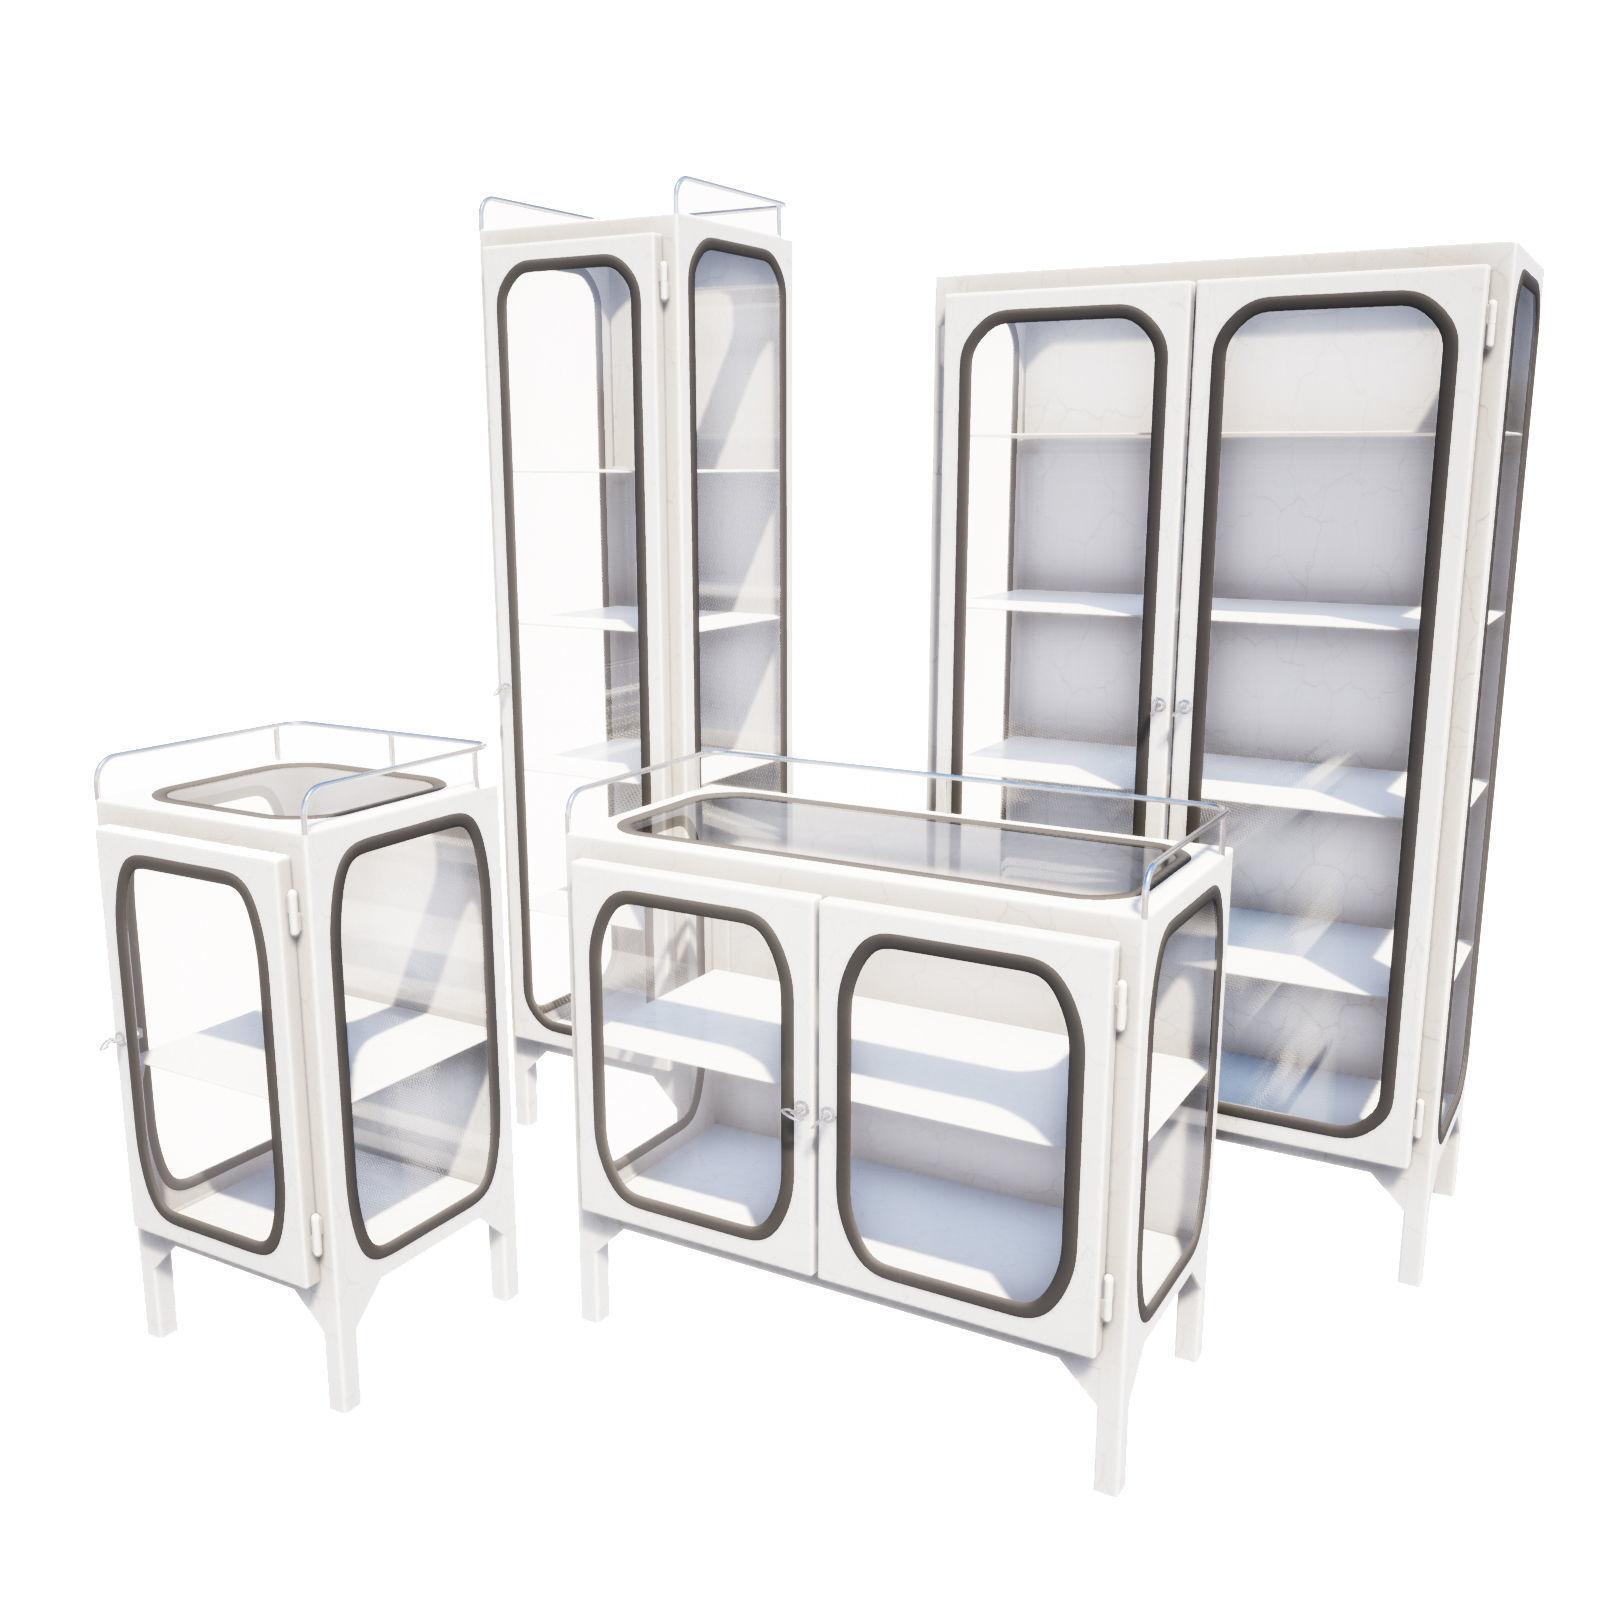 Set of Doctors cabinets